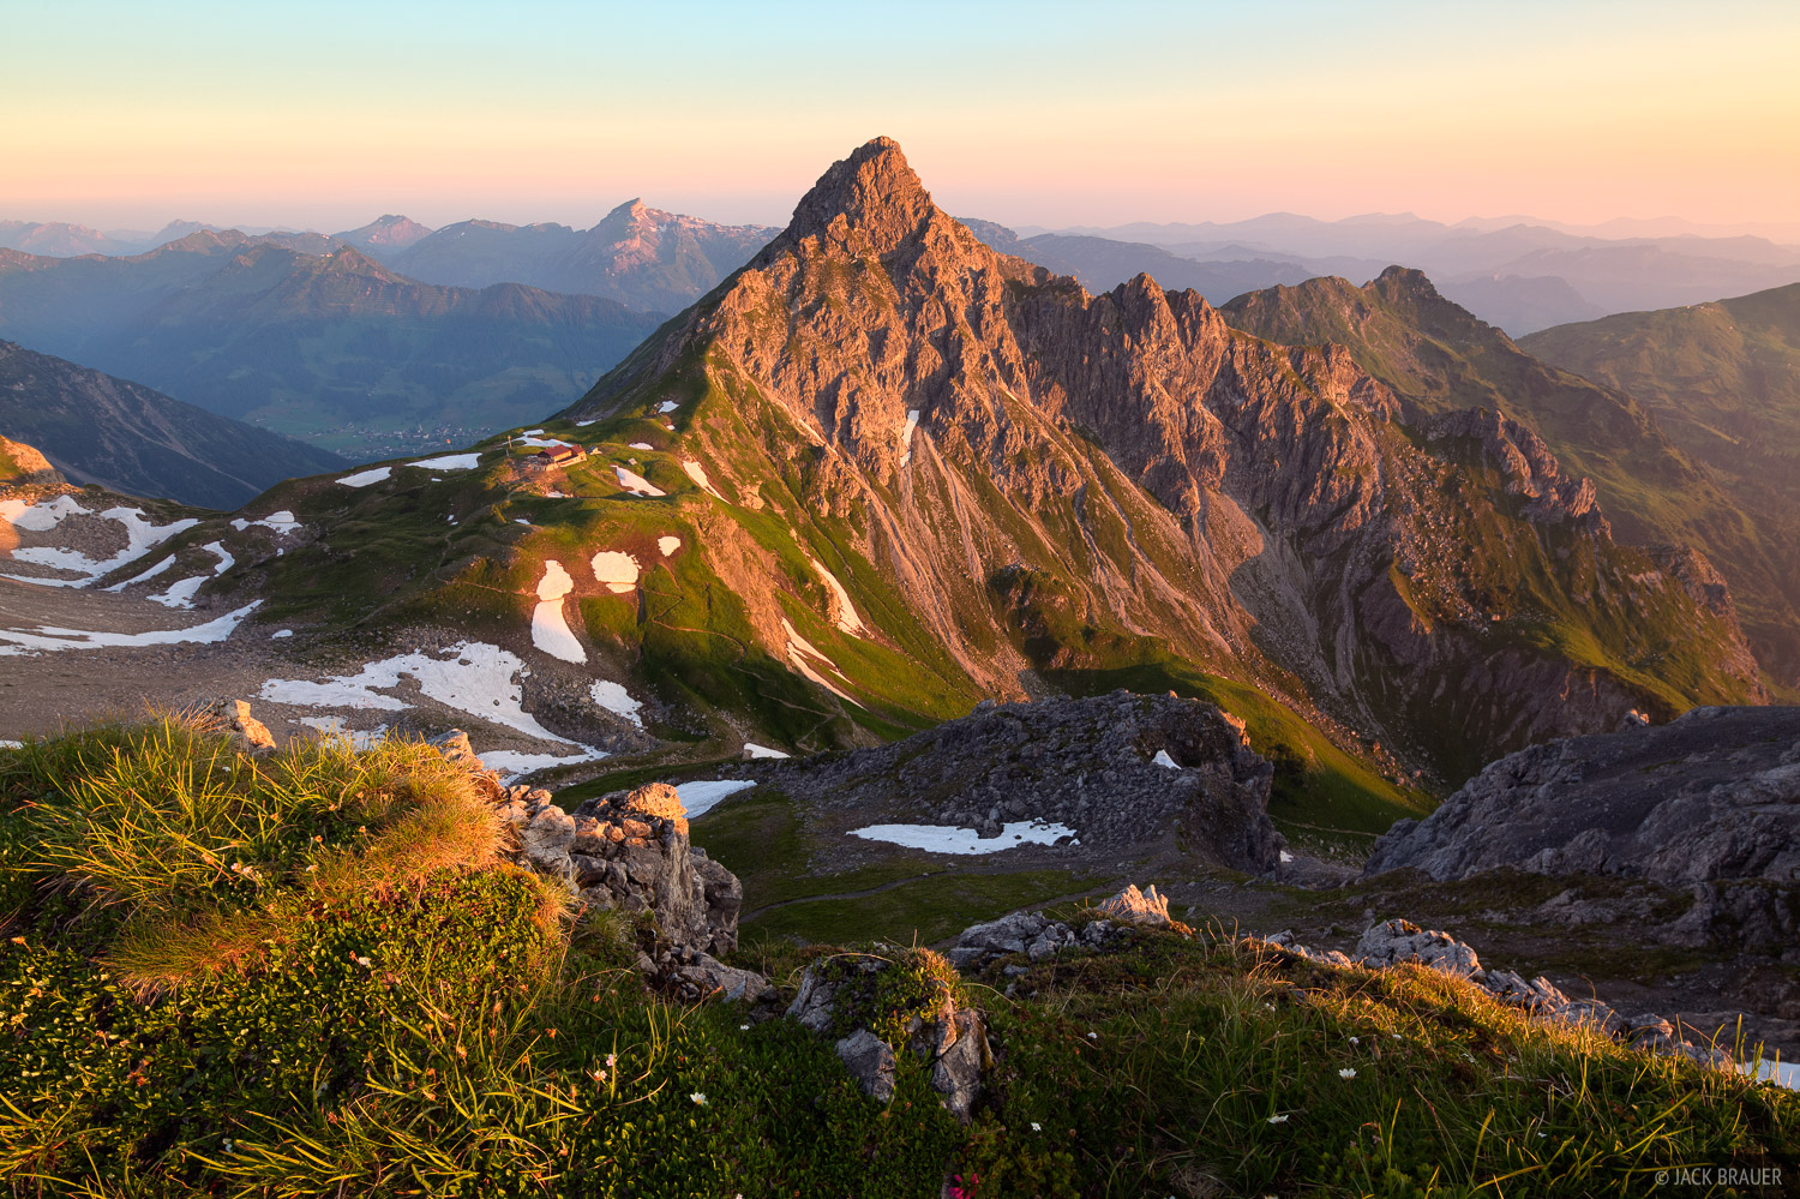 Allgäuer Alps, Germany, Schüsser, Fiderapasshütte, Fiderapass, photo